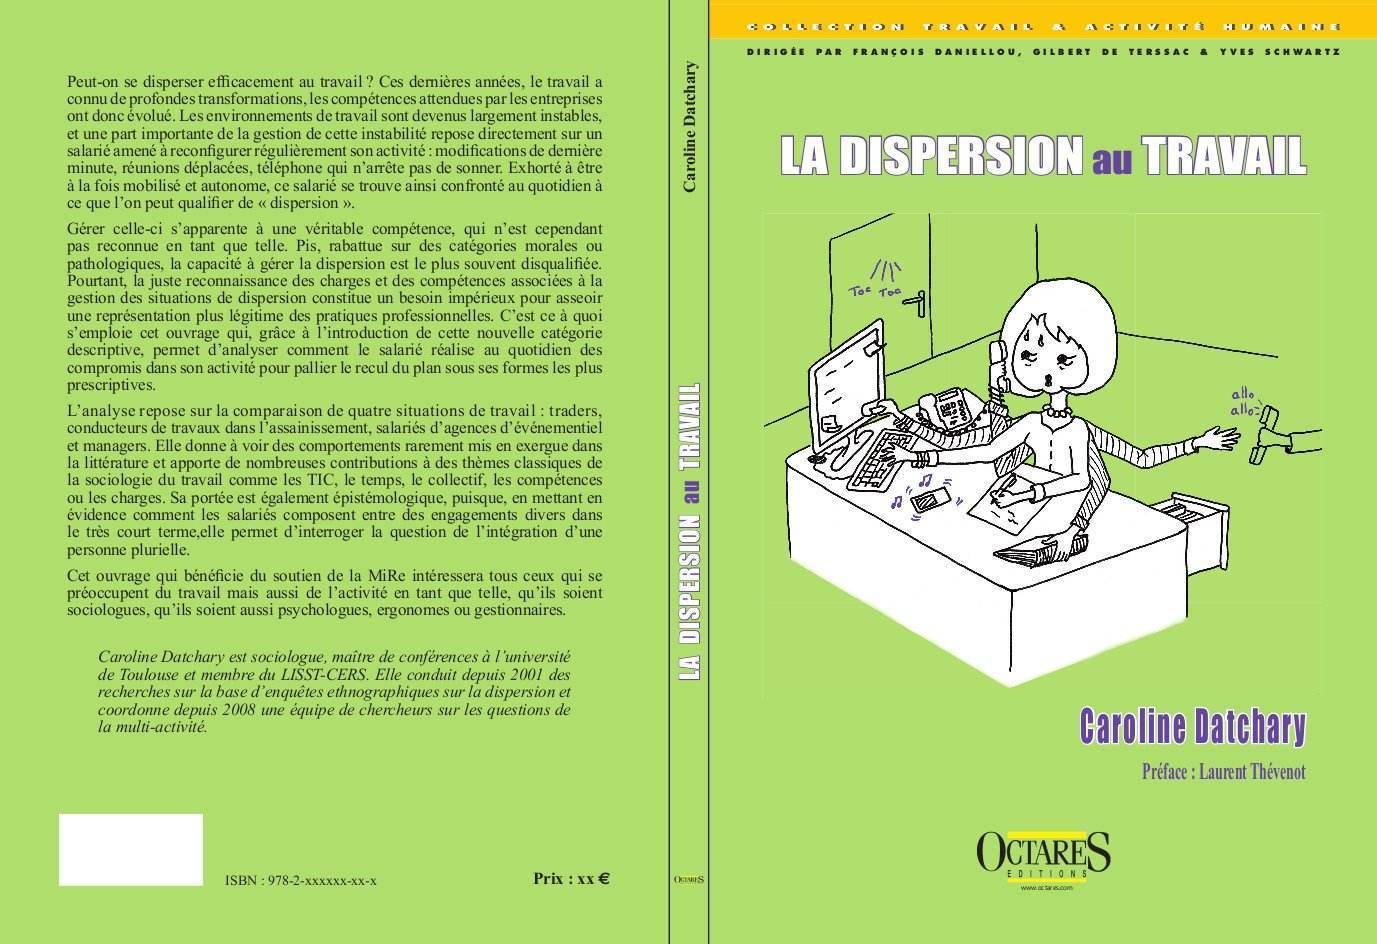 Couv._La_dispersion_au_travail_2.jpeg